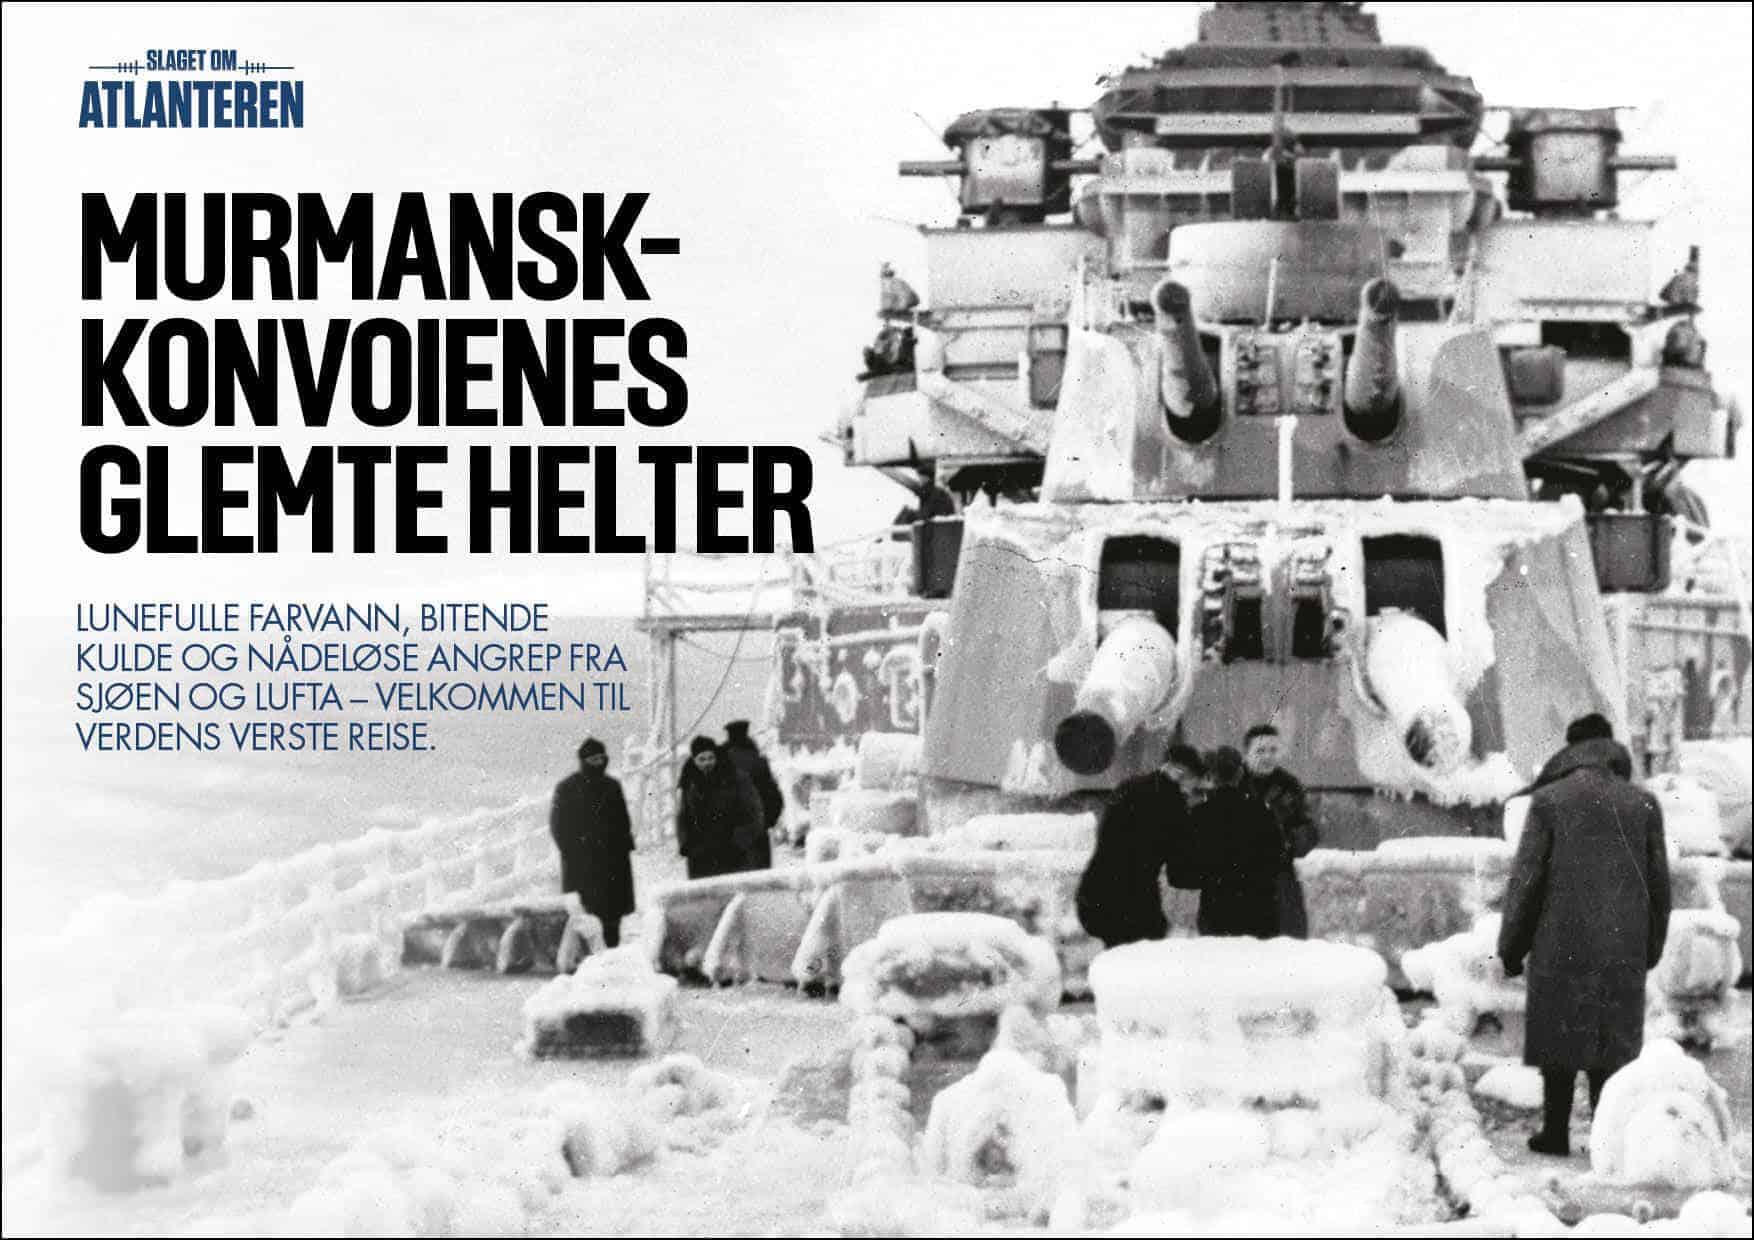 Murmansk-konvoienes glemte helter